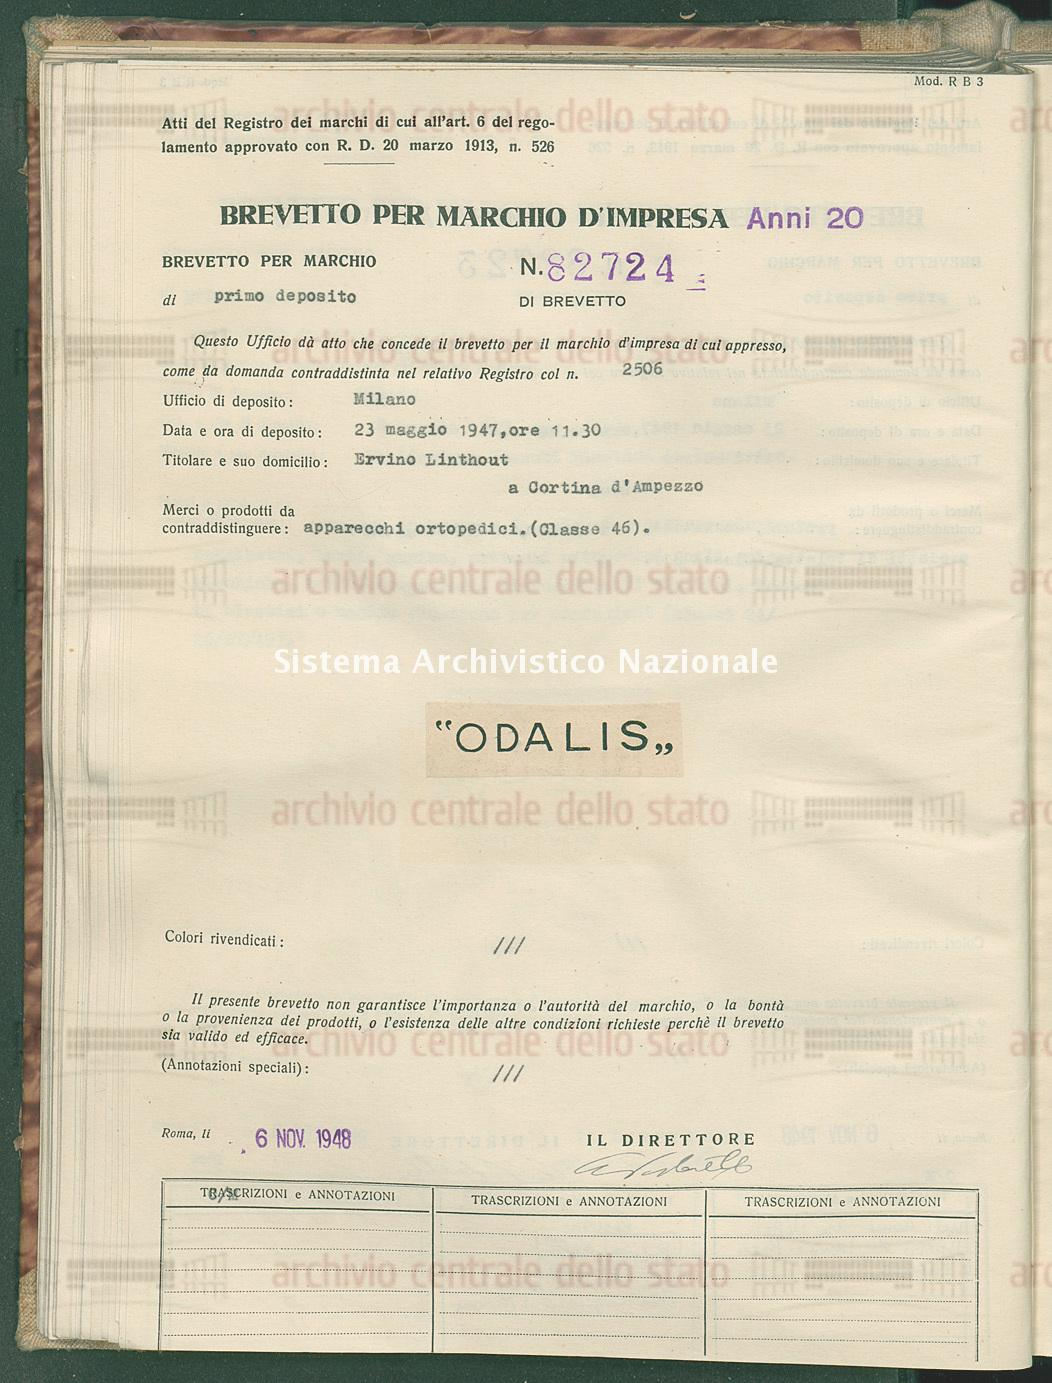 Apparecchi ortopedici Ervino Linthout (06/11/1948)